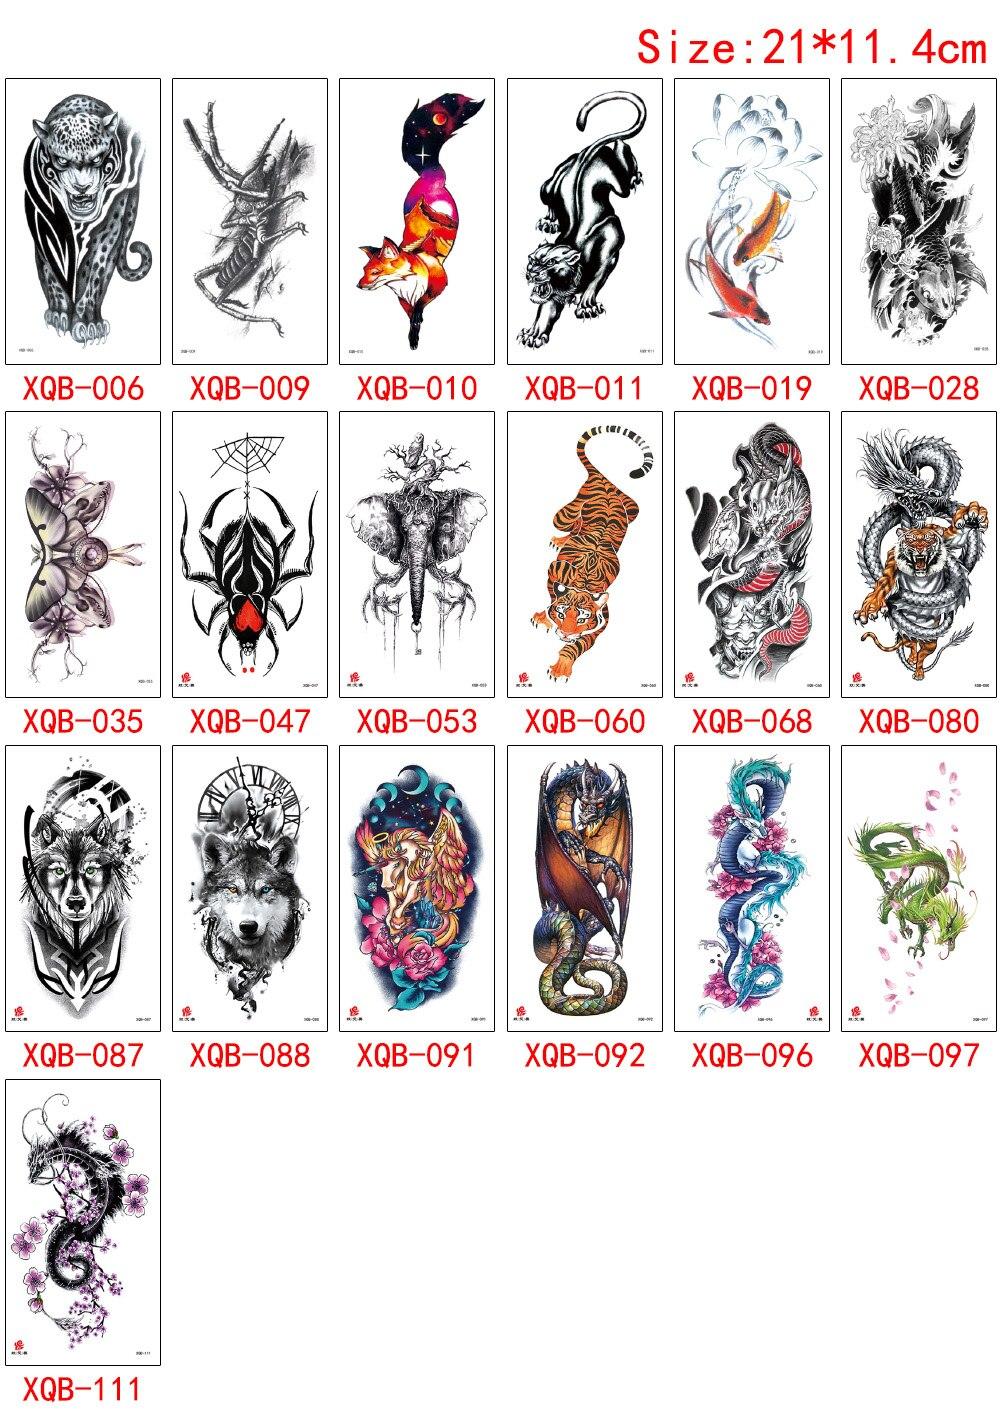 Ferocity Animal Design Tattoo Fox Tiger Wolf Dragon Spider Elephant for Woman Man Arm Sleeve Back Waist Temporary Tattoo Sticker (5)